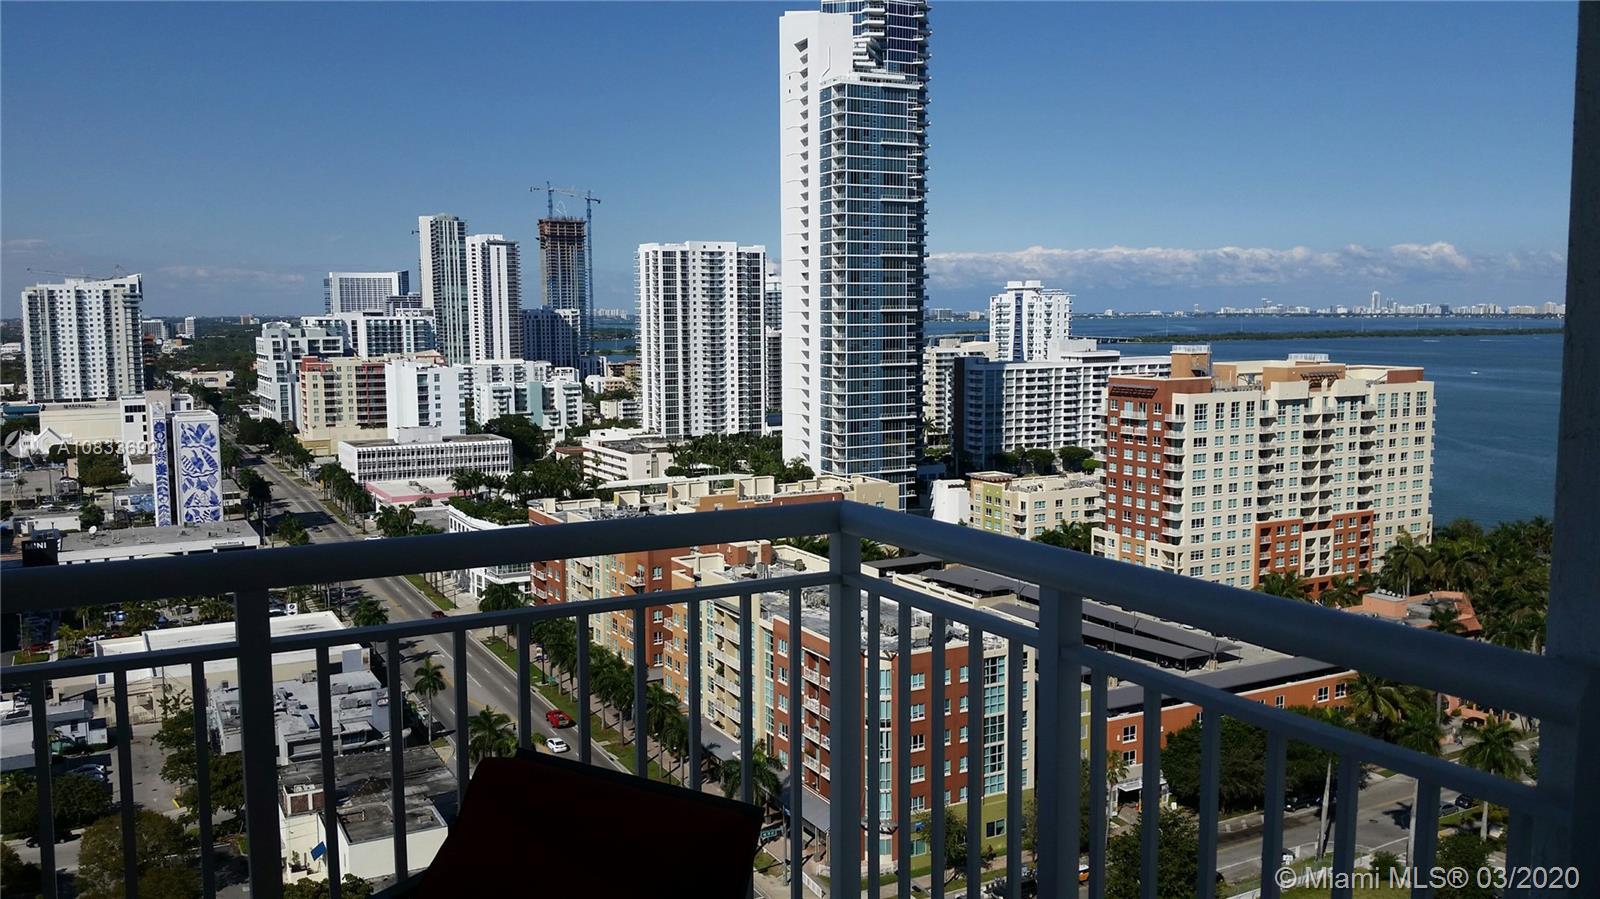 1800 Biscayne Plaza #PH-10 - 275 NE 18th St #PH-10, Miami, FL 33132